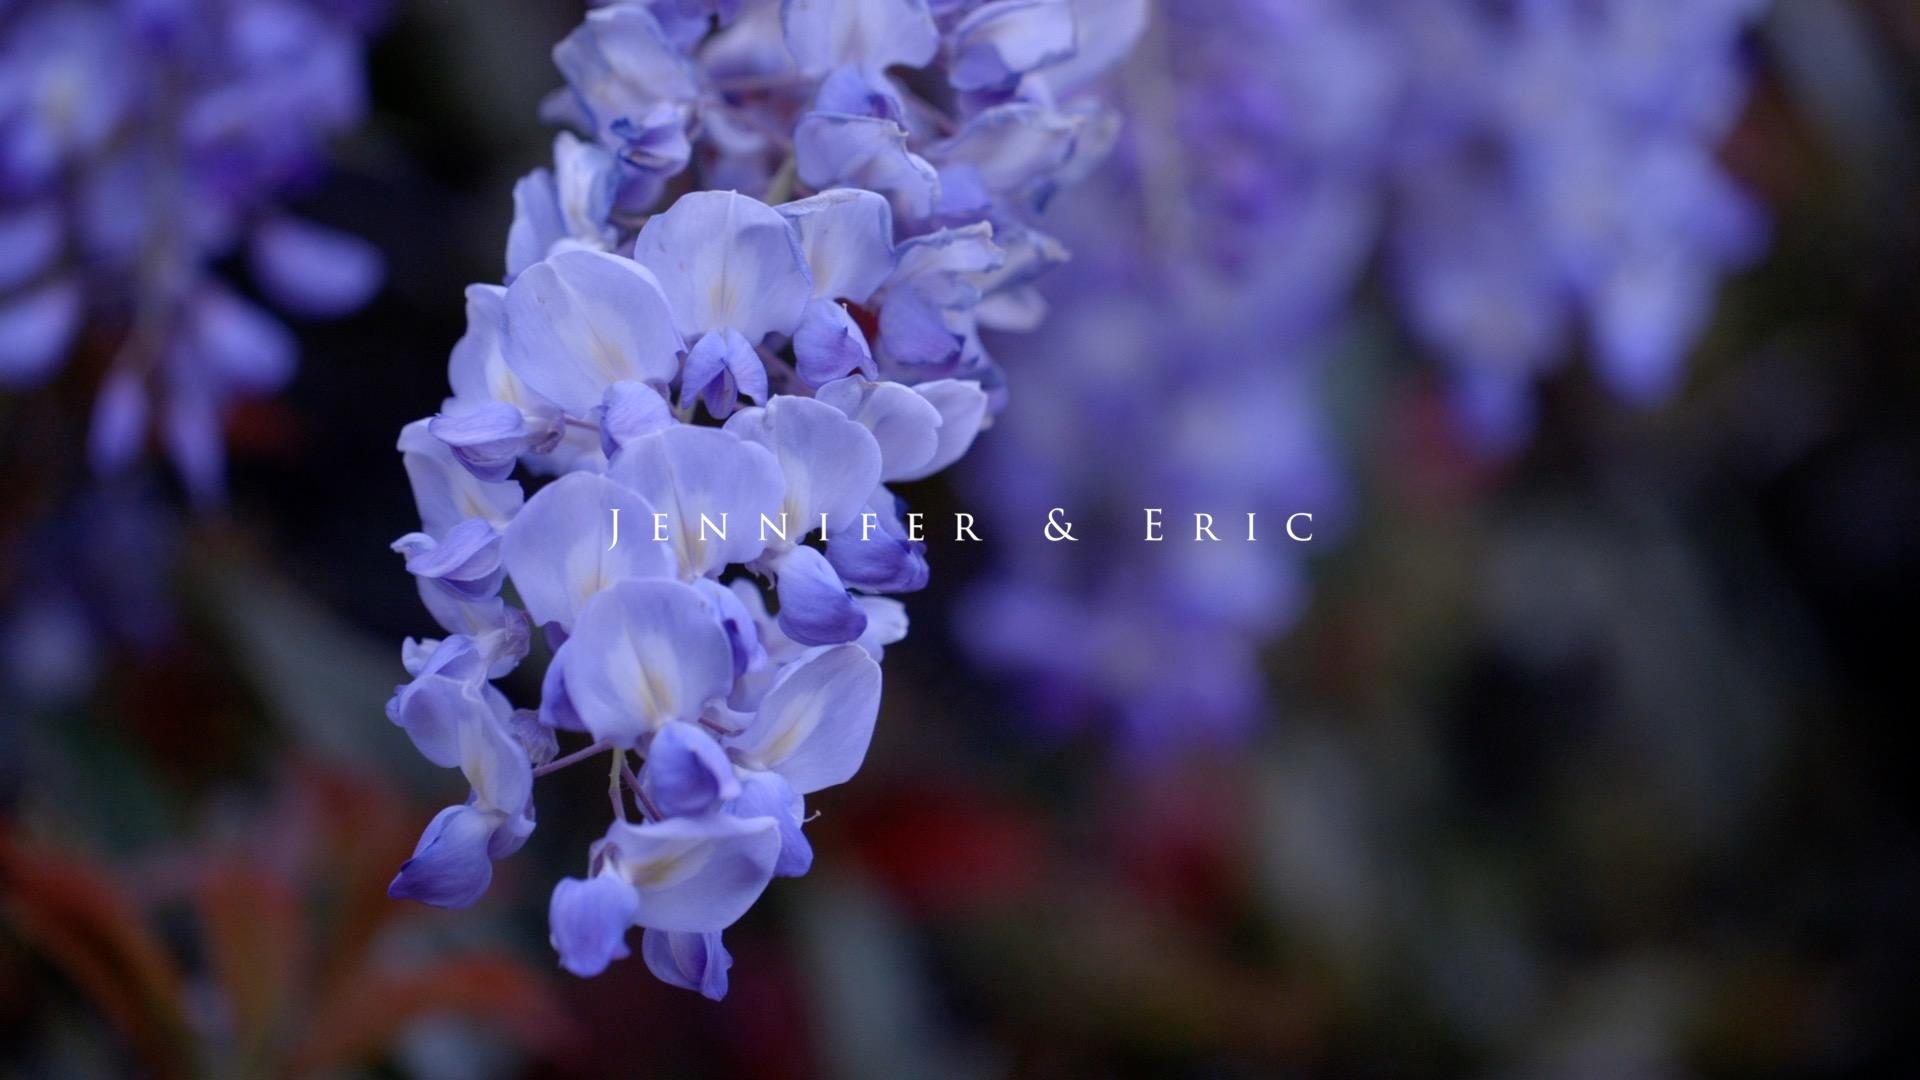 Cinematic Highlight Film - Jennifer & Eric2.jpg